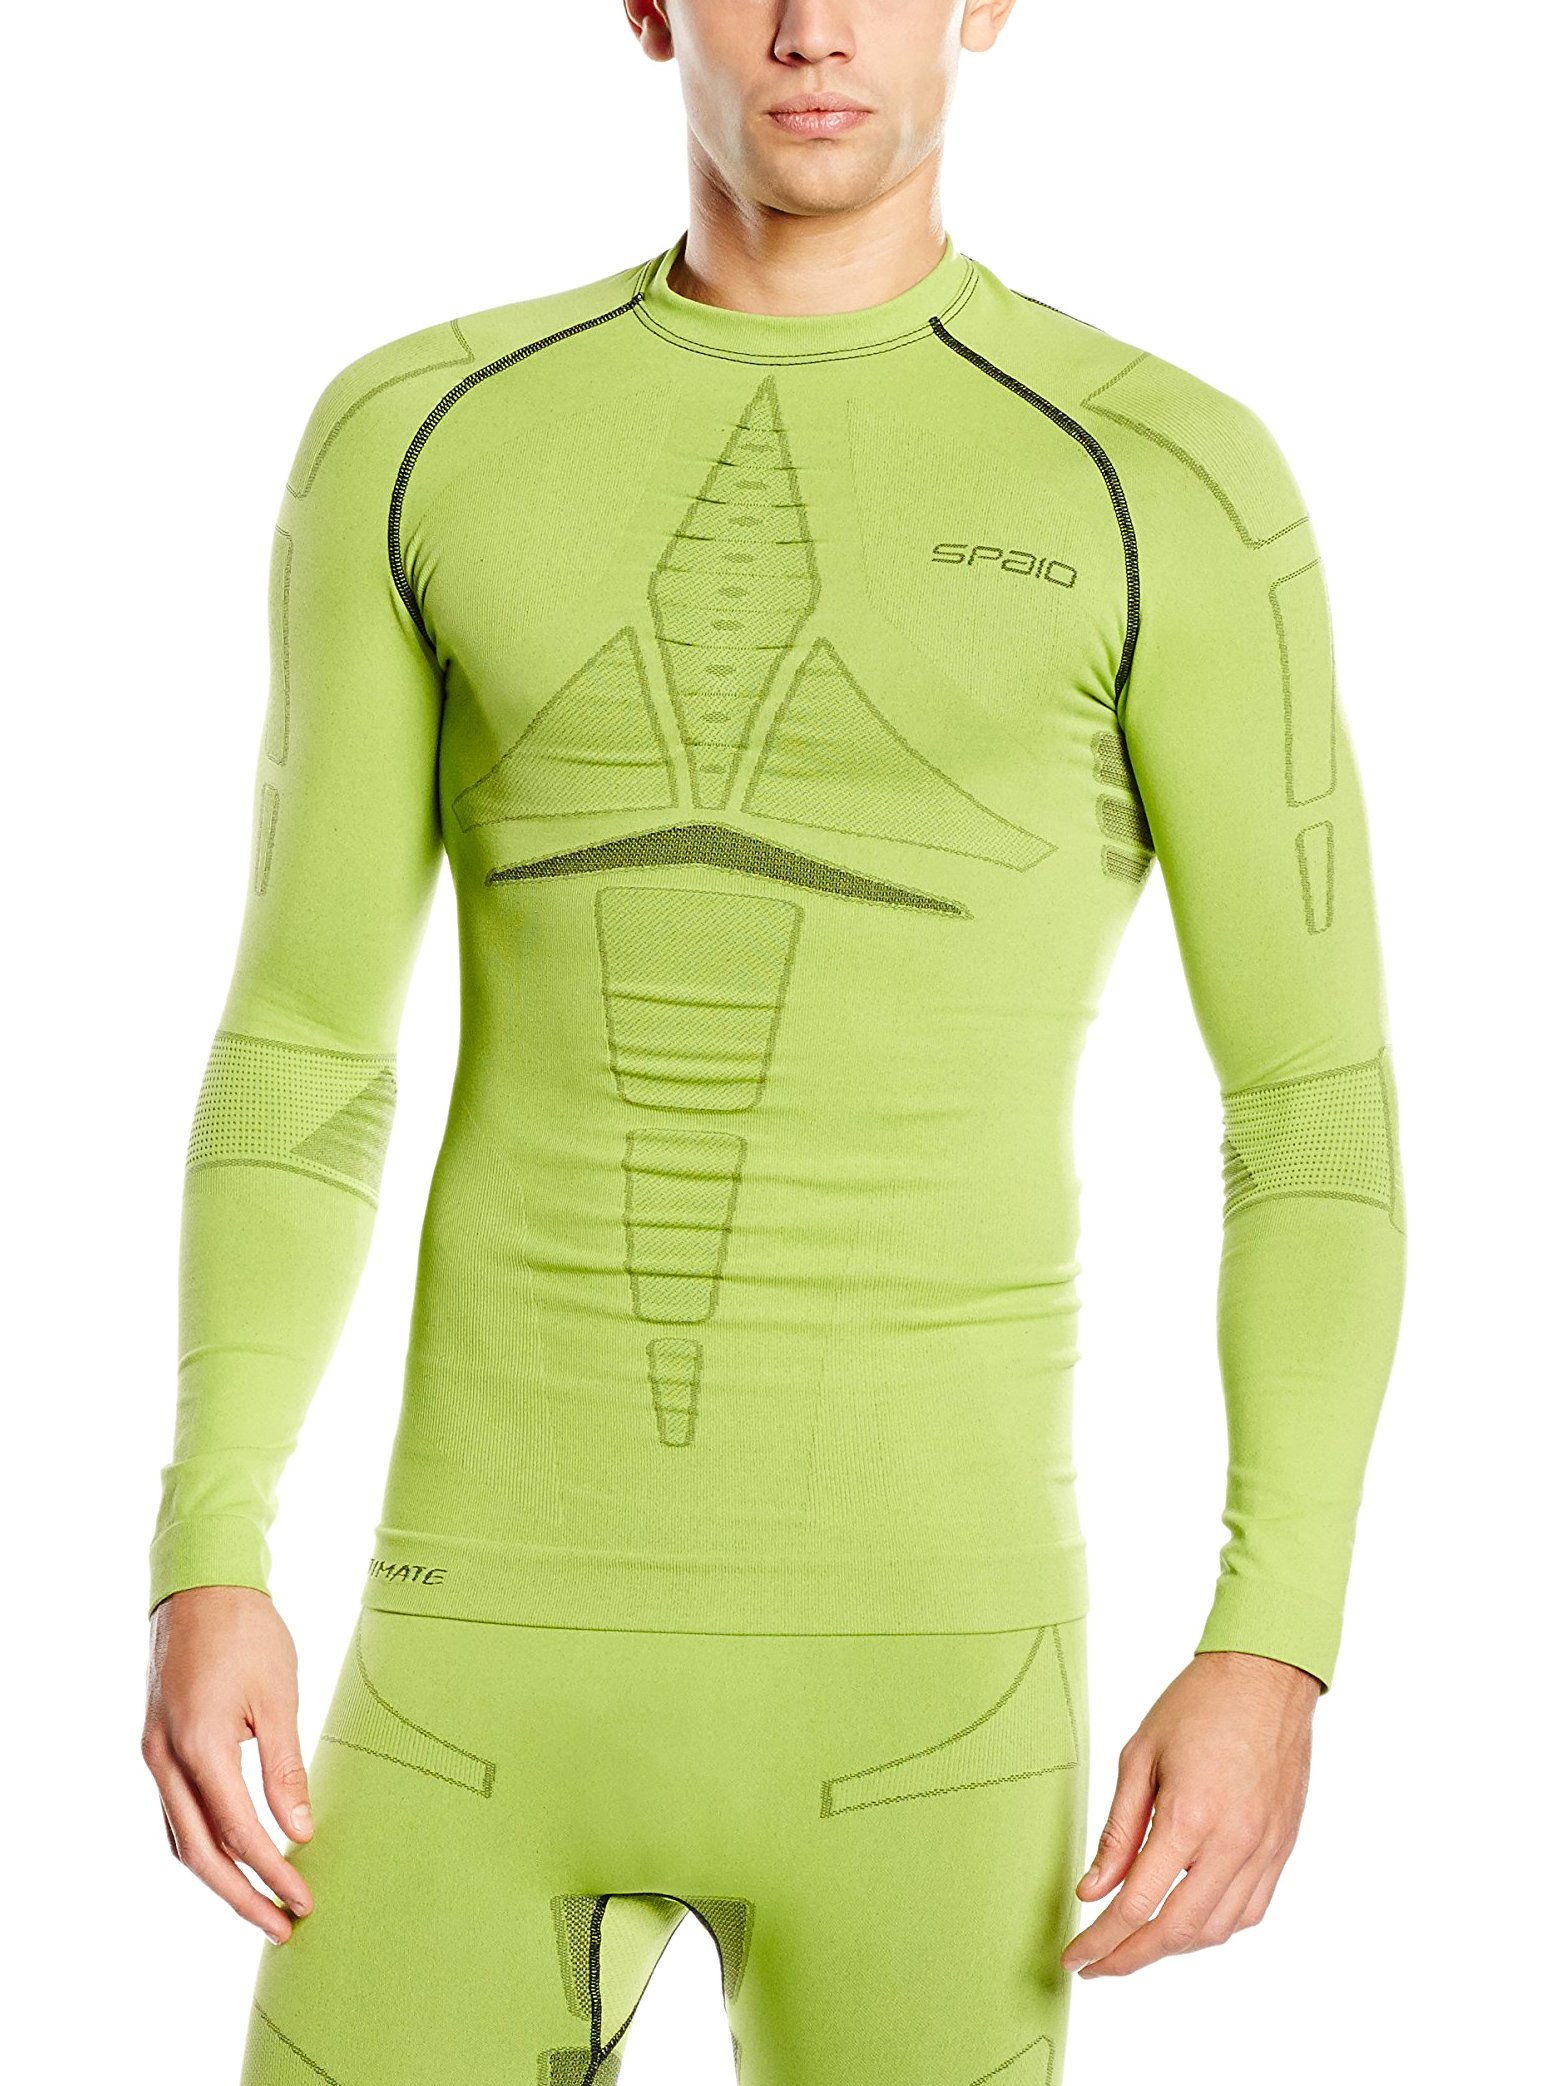 SPAIO ® Herren Shirt Ultimate, Lime, L, 5901282032961